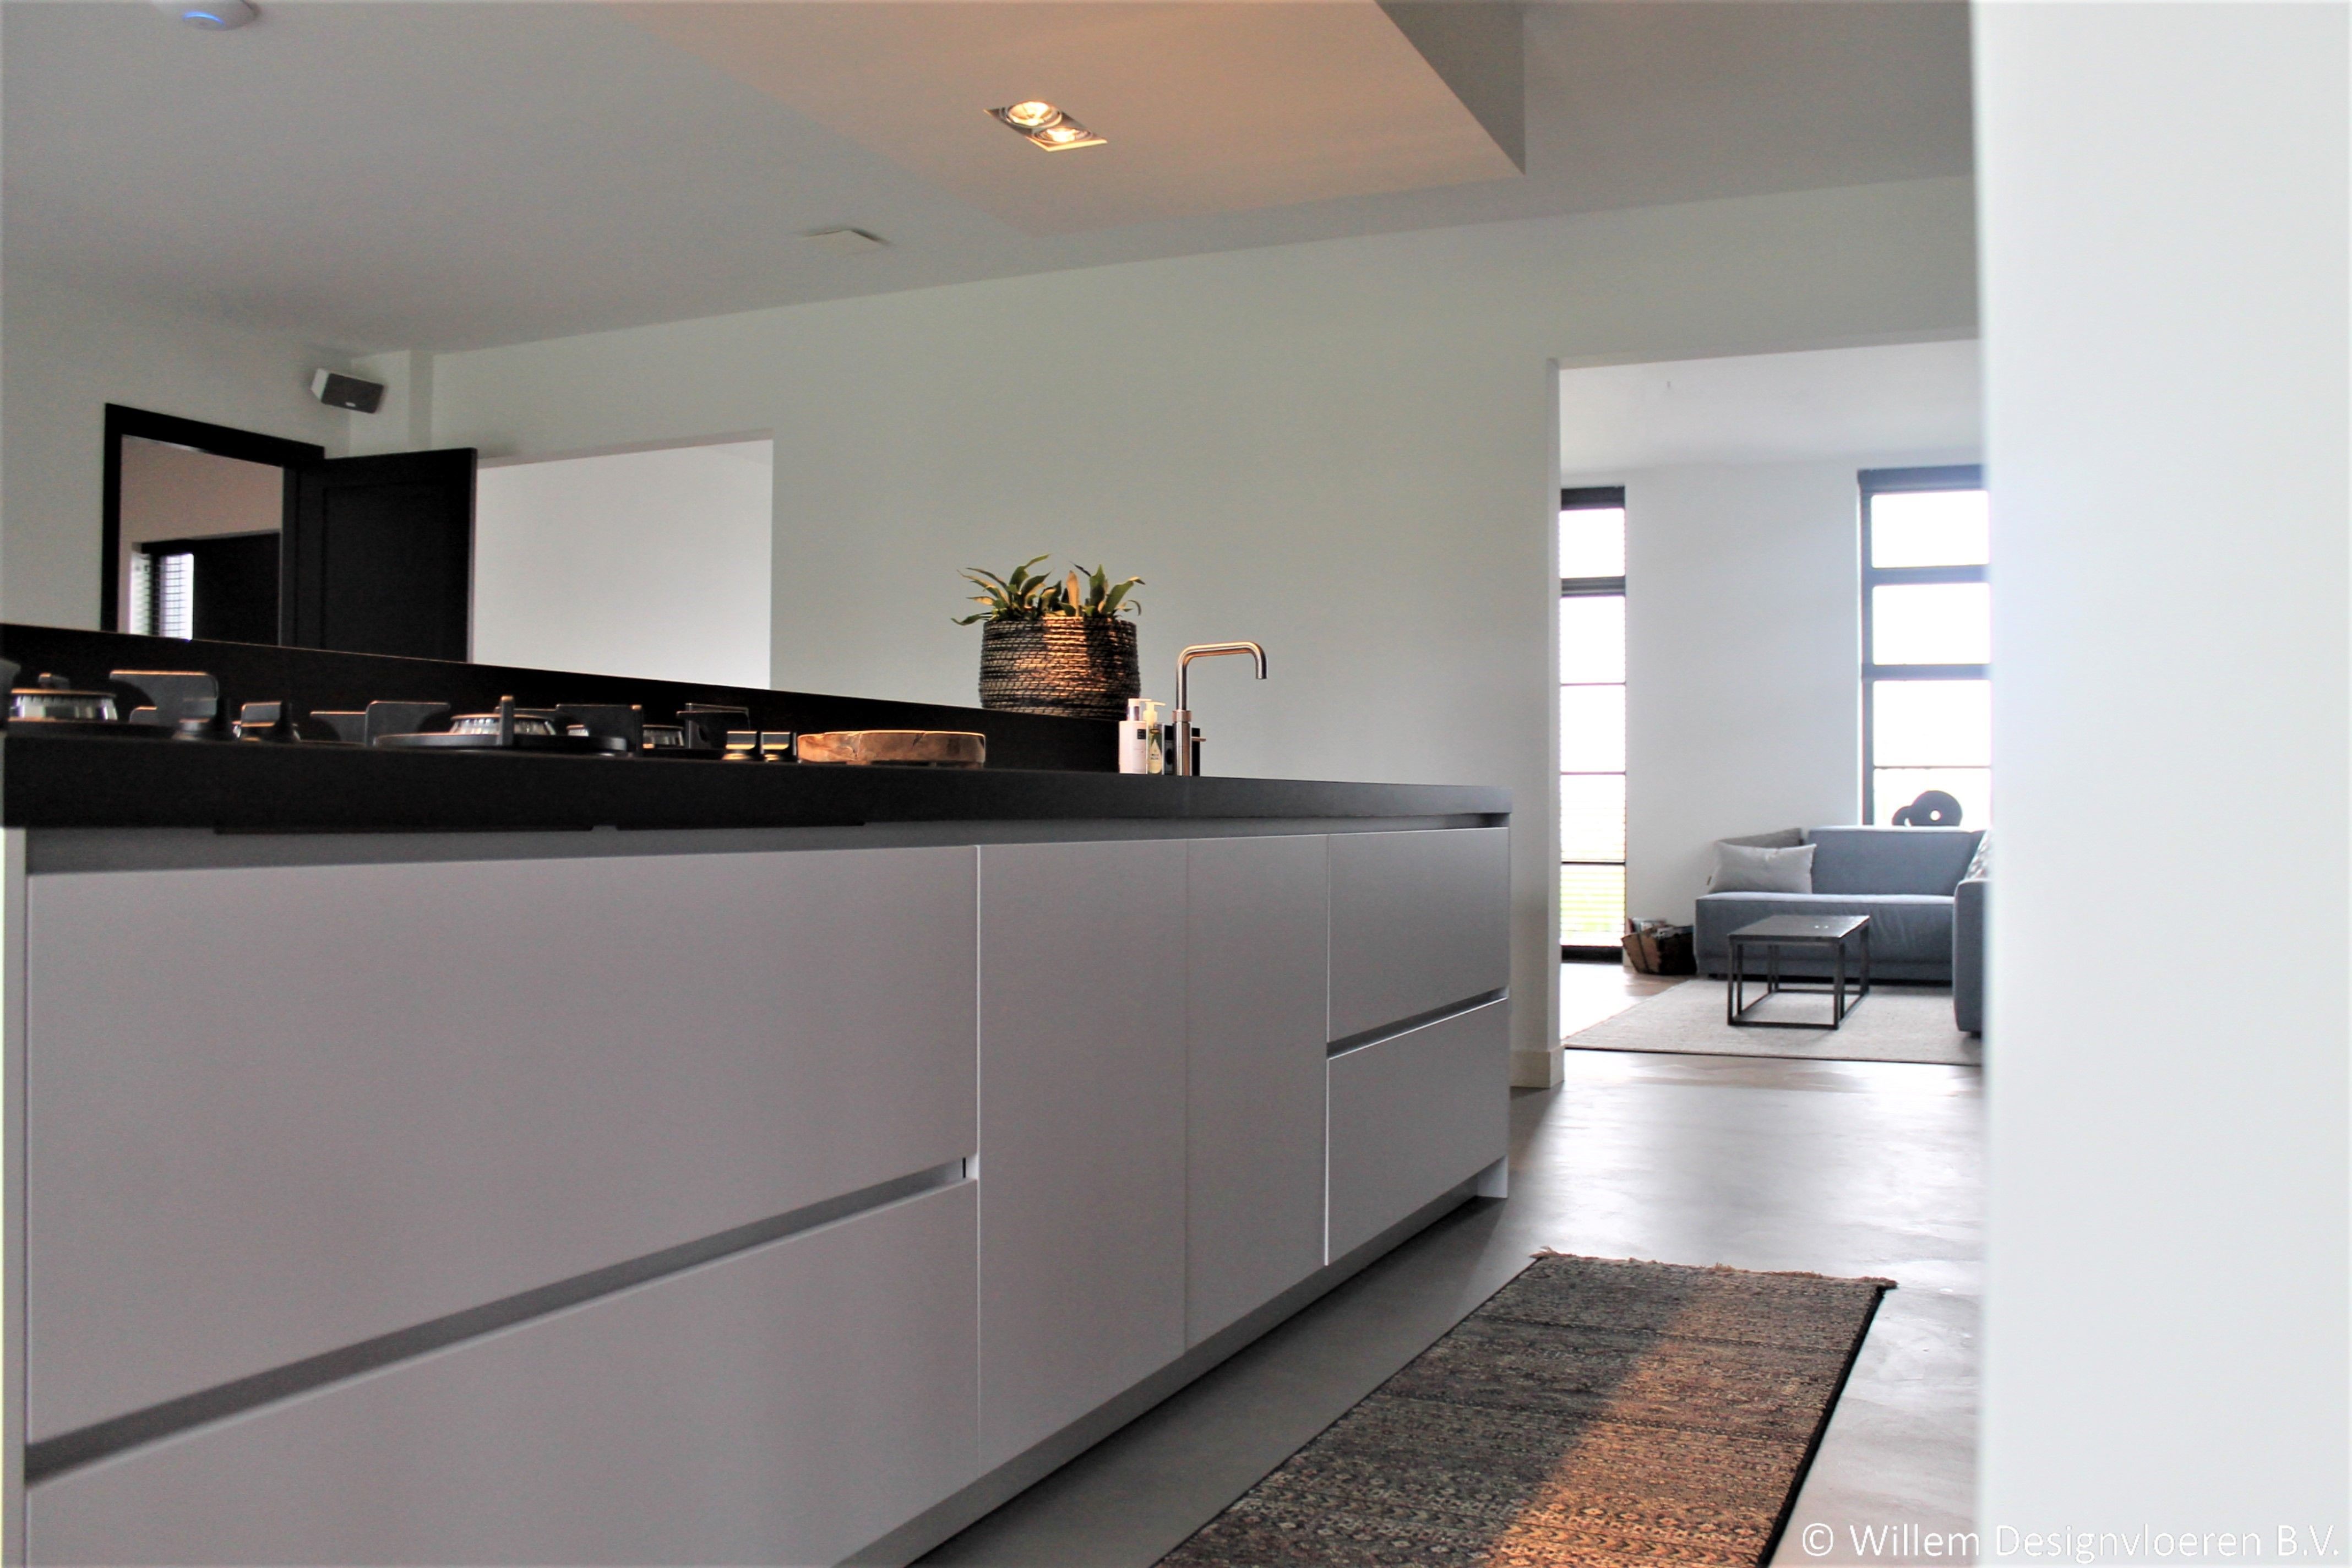 Betoon Look Vloer : Betonlook vloer u willem designvloeren b v portfolio beton